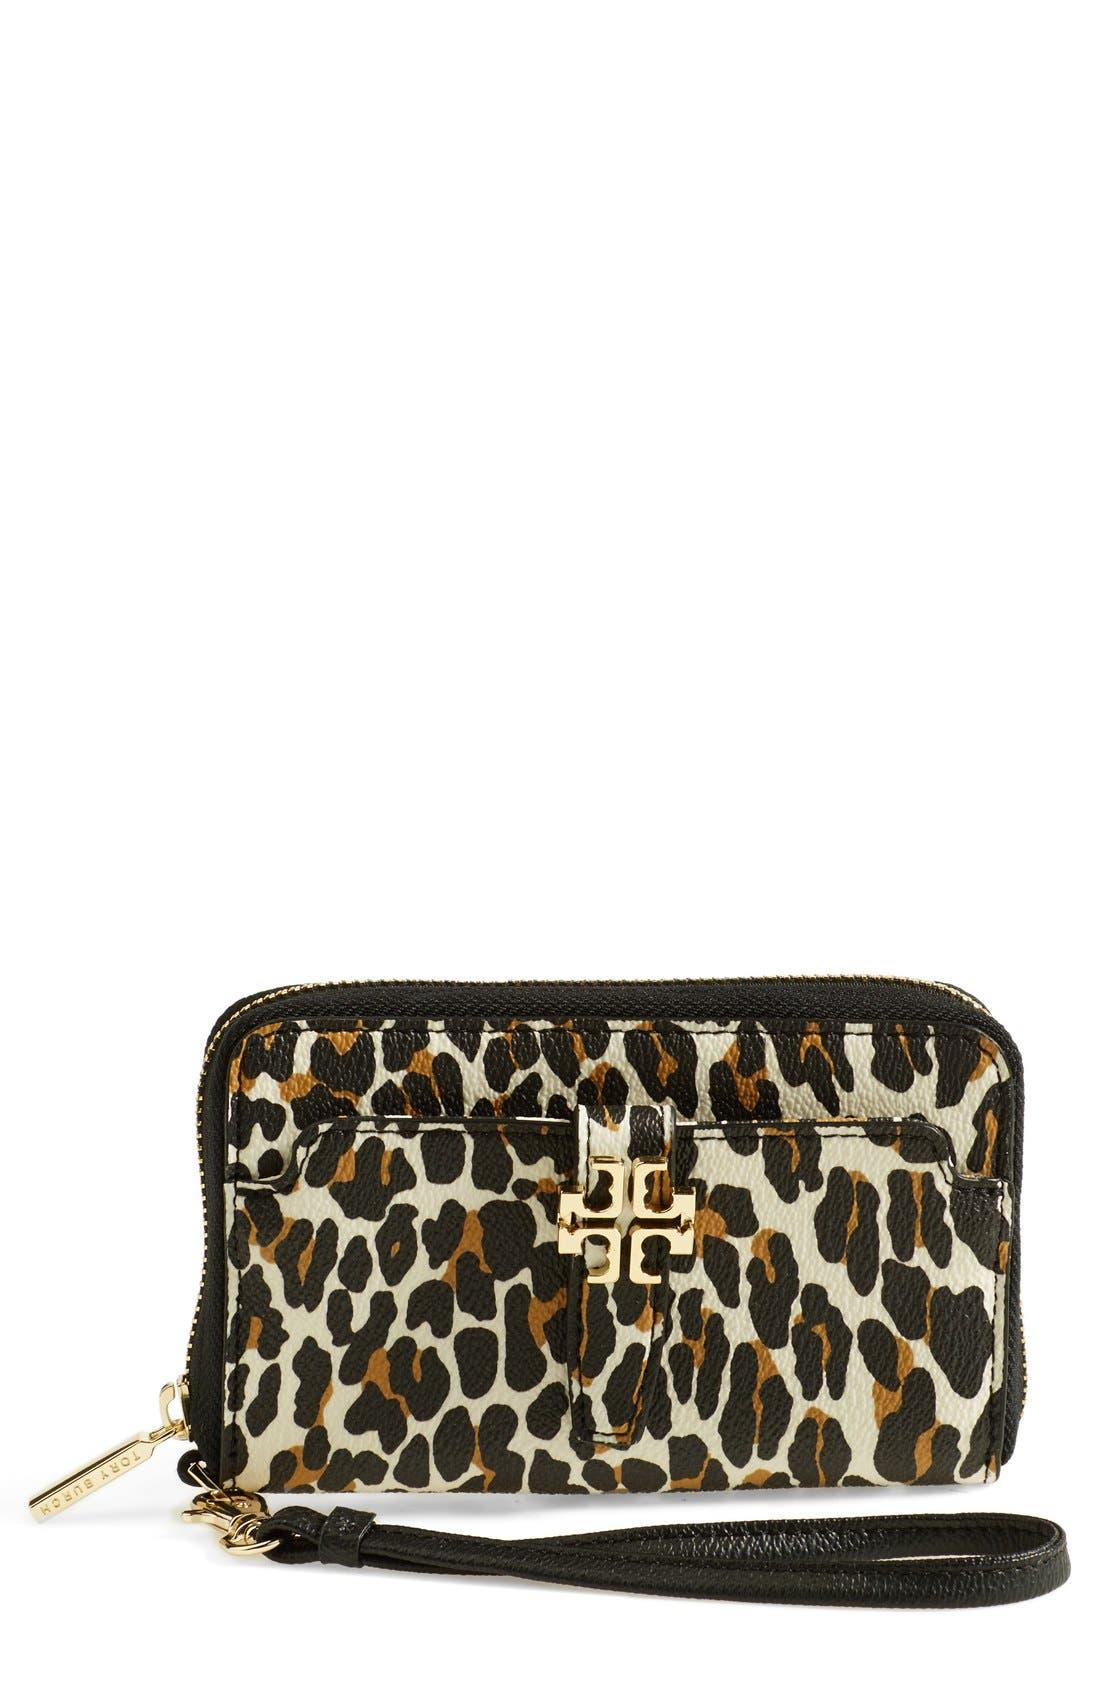 Main Image - Tory Burch 'Plaque' Leopard Print Smartphone Wristlet